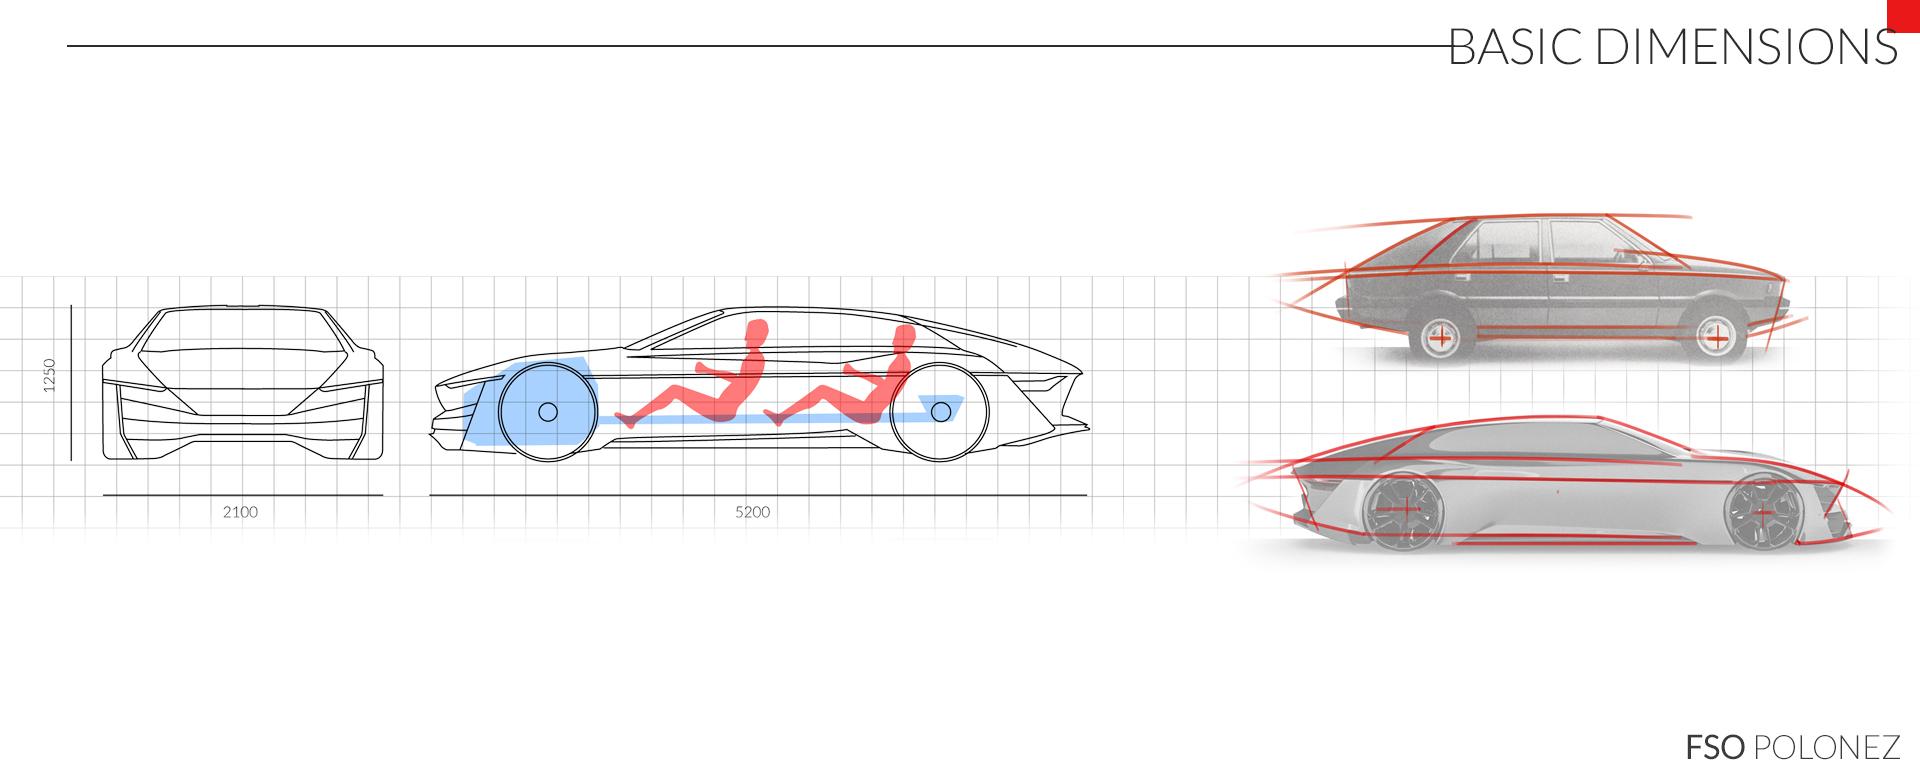 Basic design of a car - Basic Design Of A Car 77